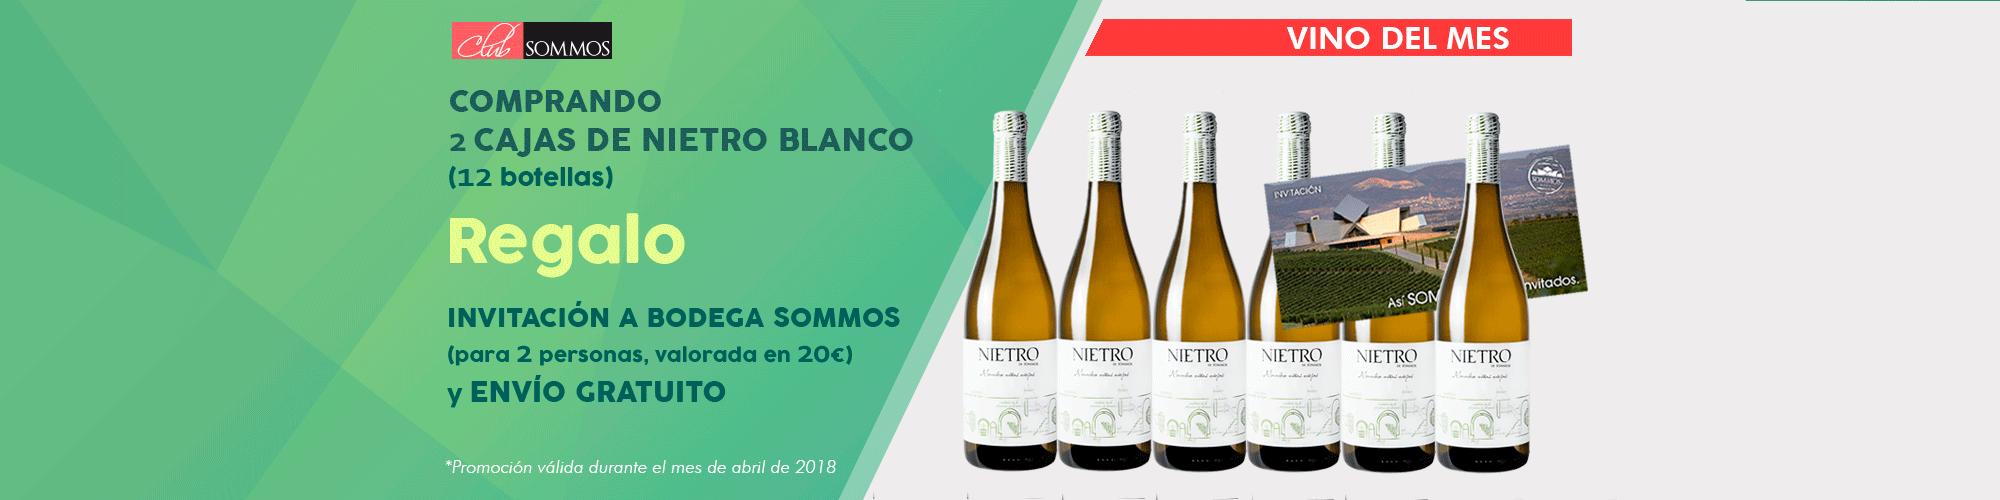 Nietro Blanco vino del mes abril 2018